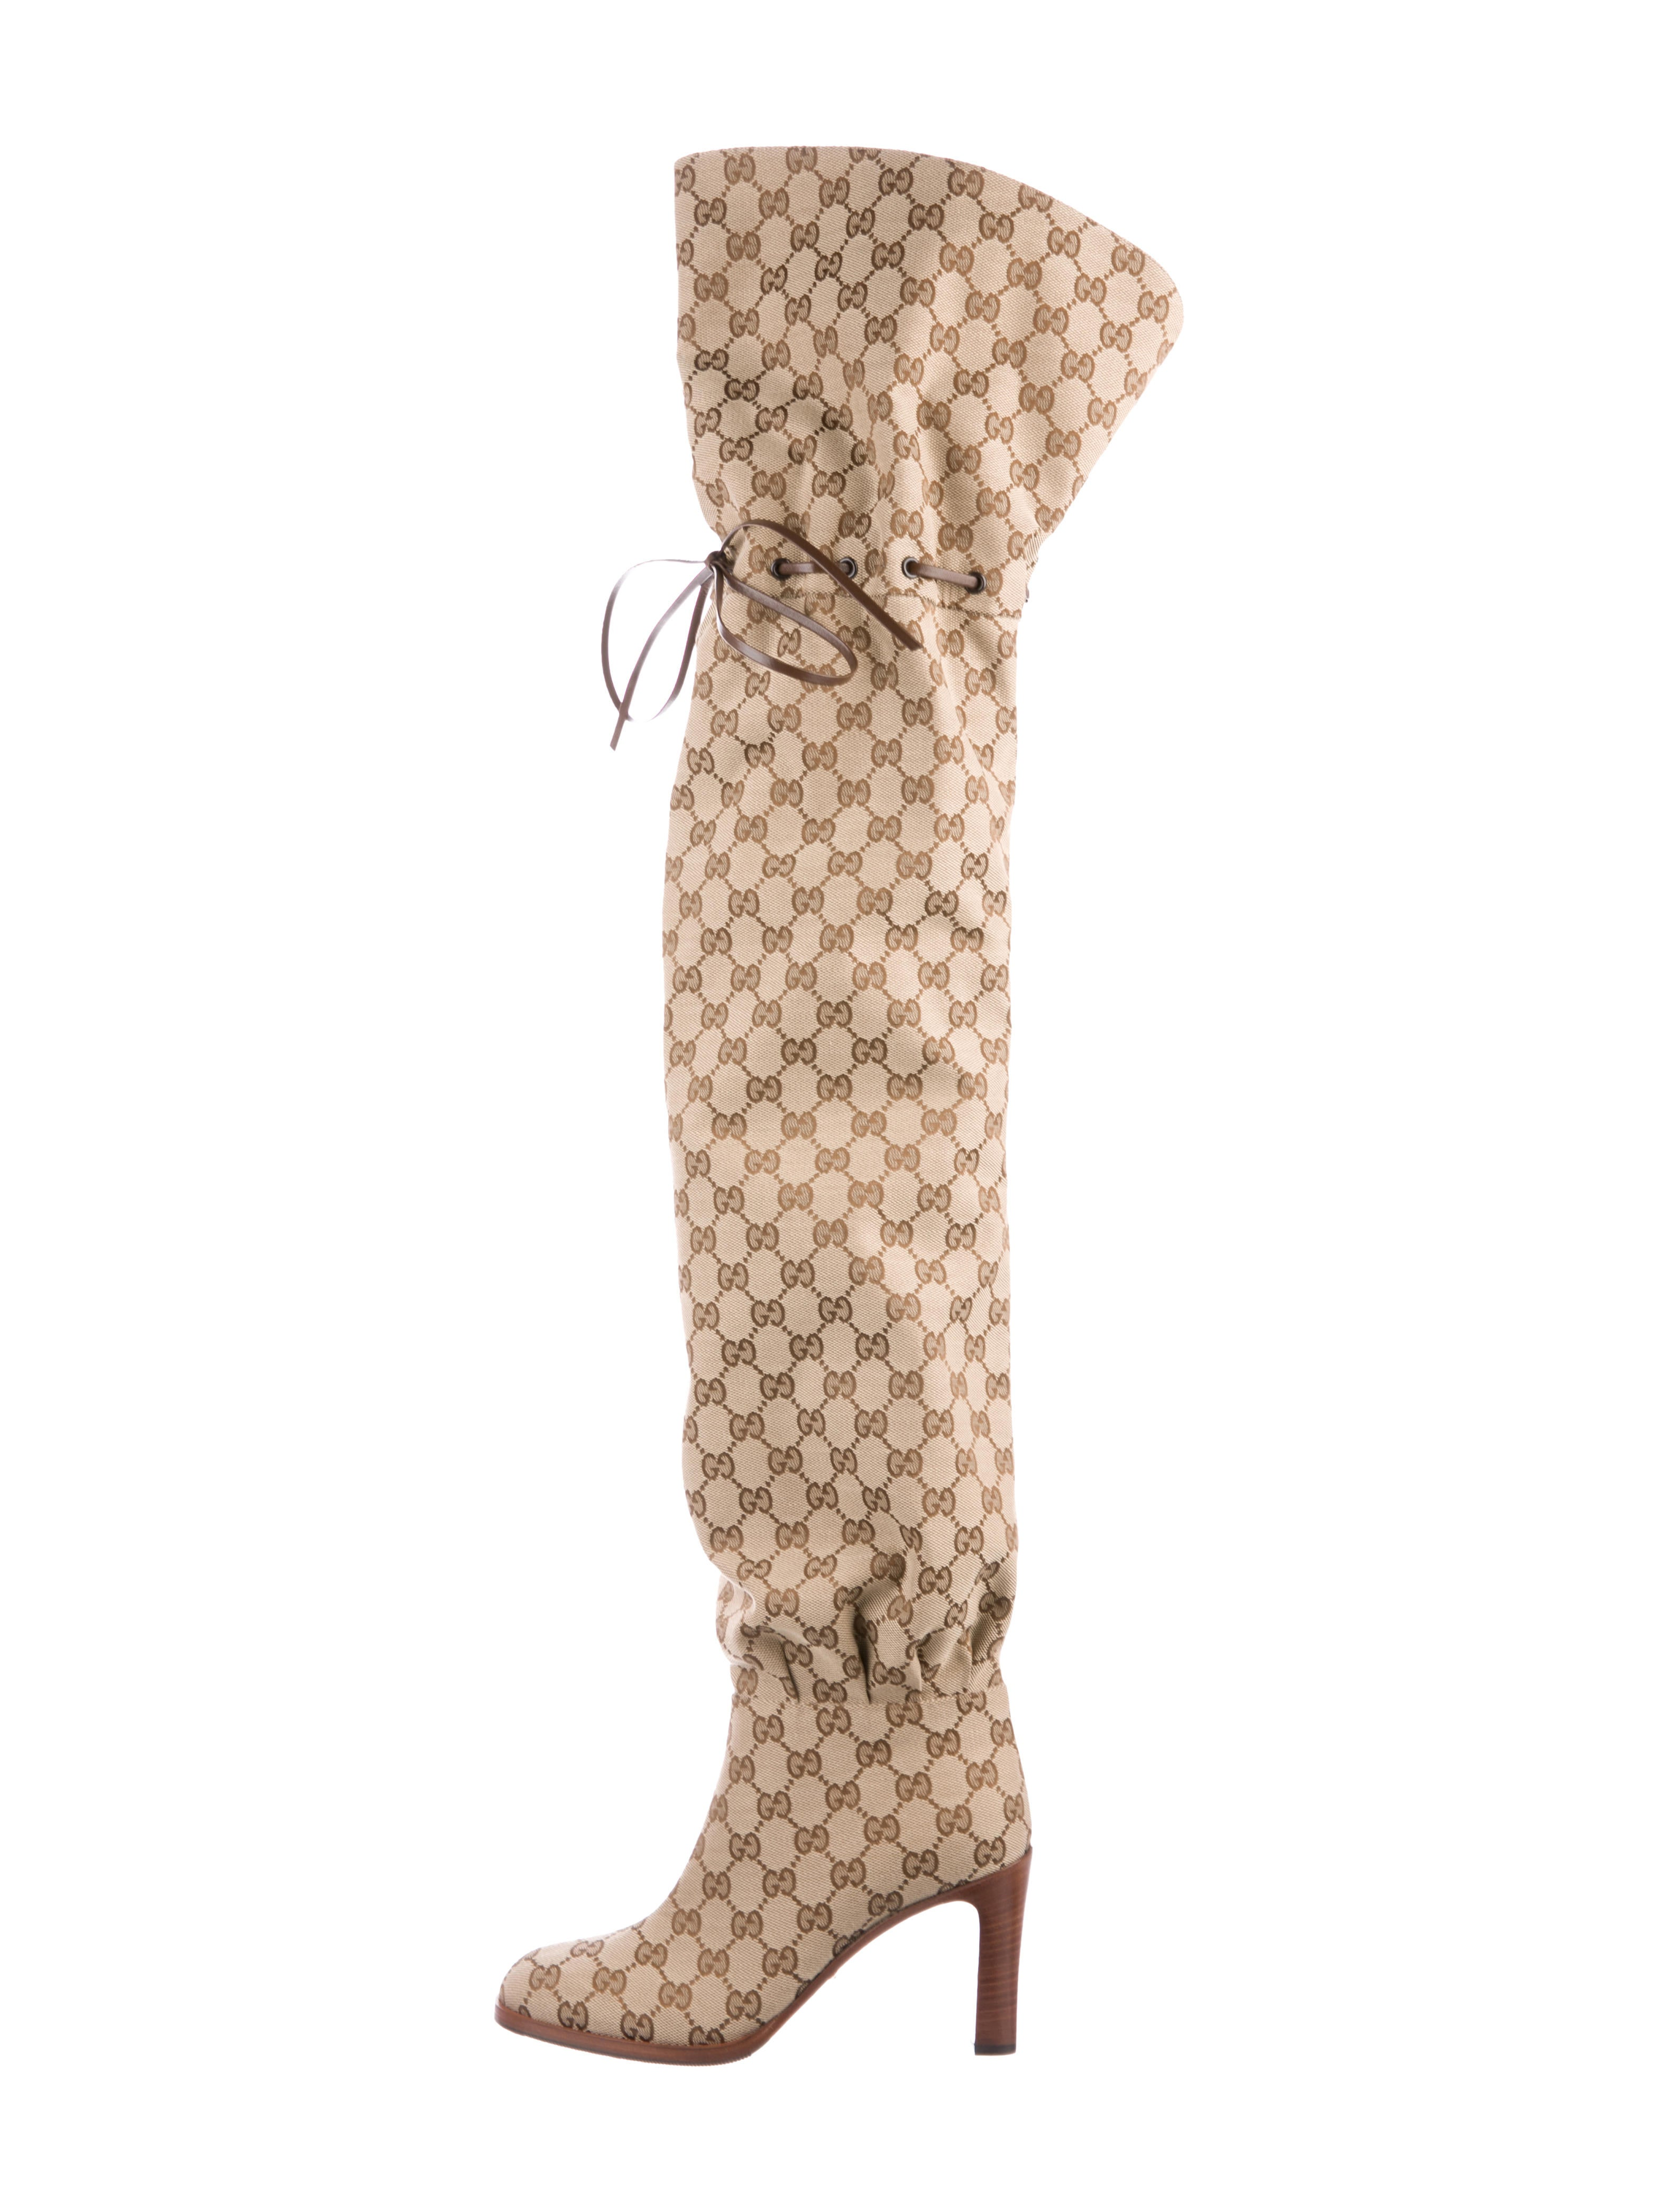 a64d61a791c Gucci Gucci 2018 Lisa GG Canvas Boots - Shoes - GUC279330